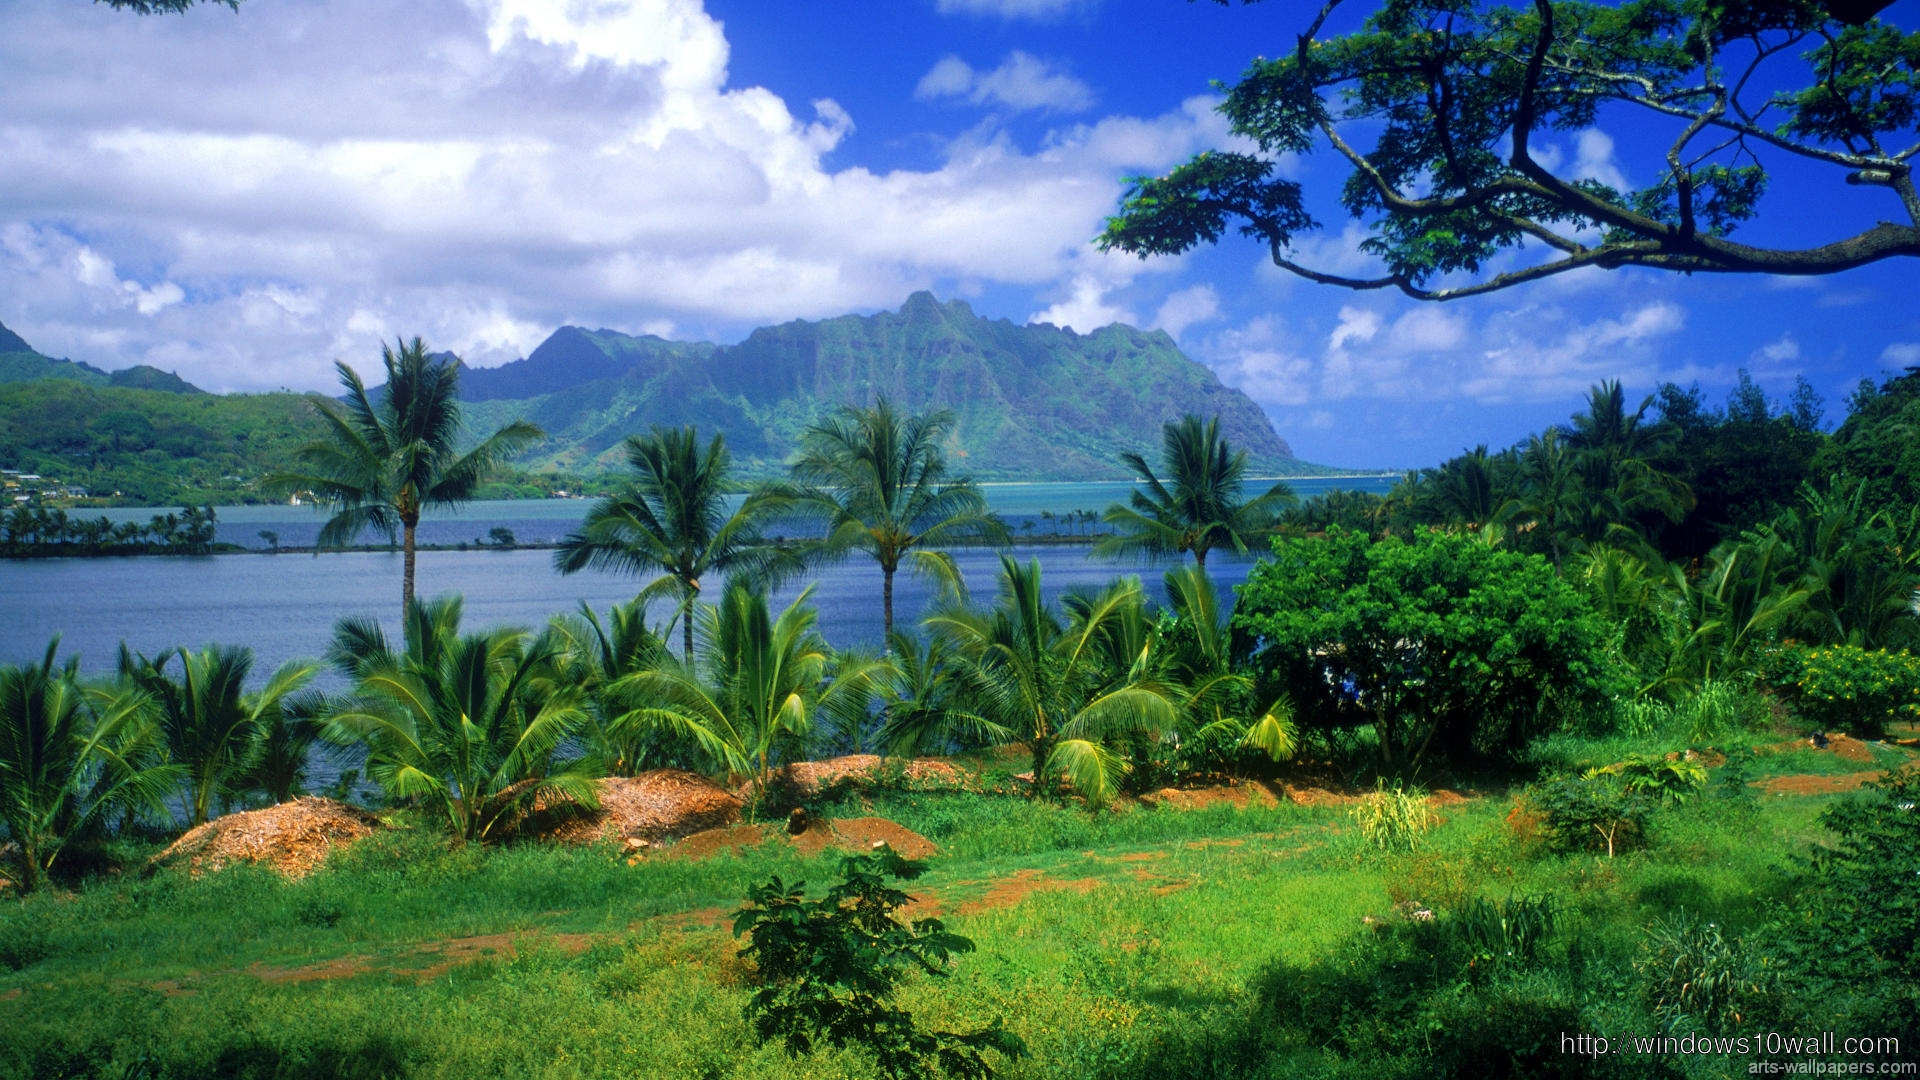 Hawaii Tropical Background Wallpaper